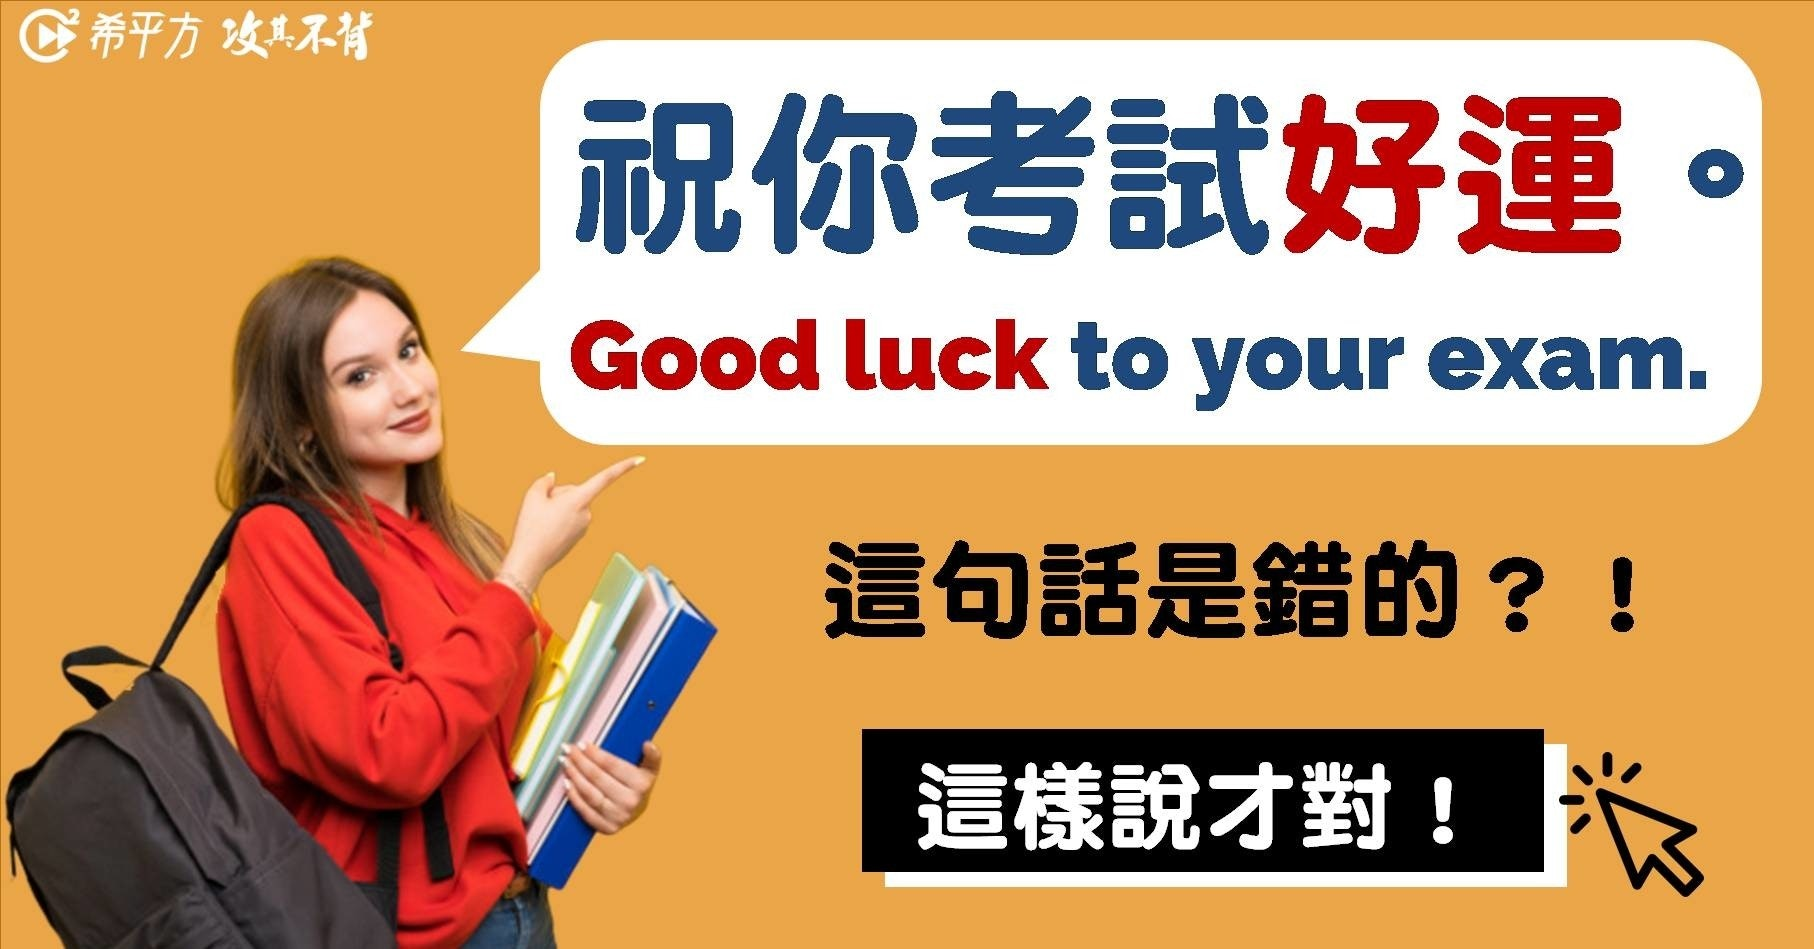 Book, Utterance, University, Conversation, Question, Public Relations, Bank, Web banner, Gratis, Cargo, banner, Font